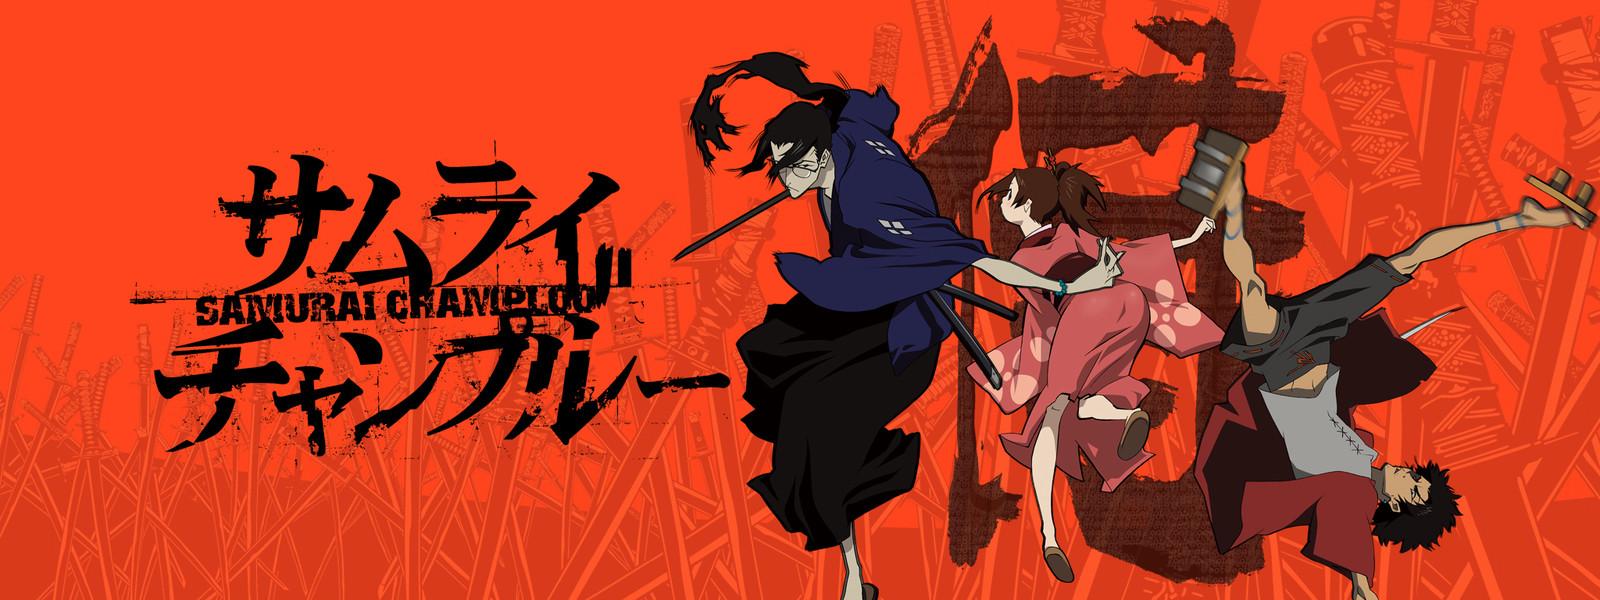 Netflixで視聴出来るおすすめアニメ サムライチャンプルー